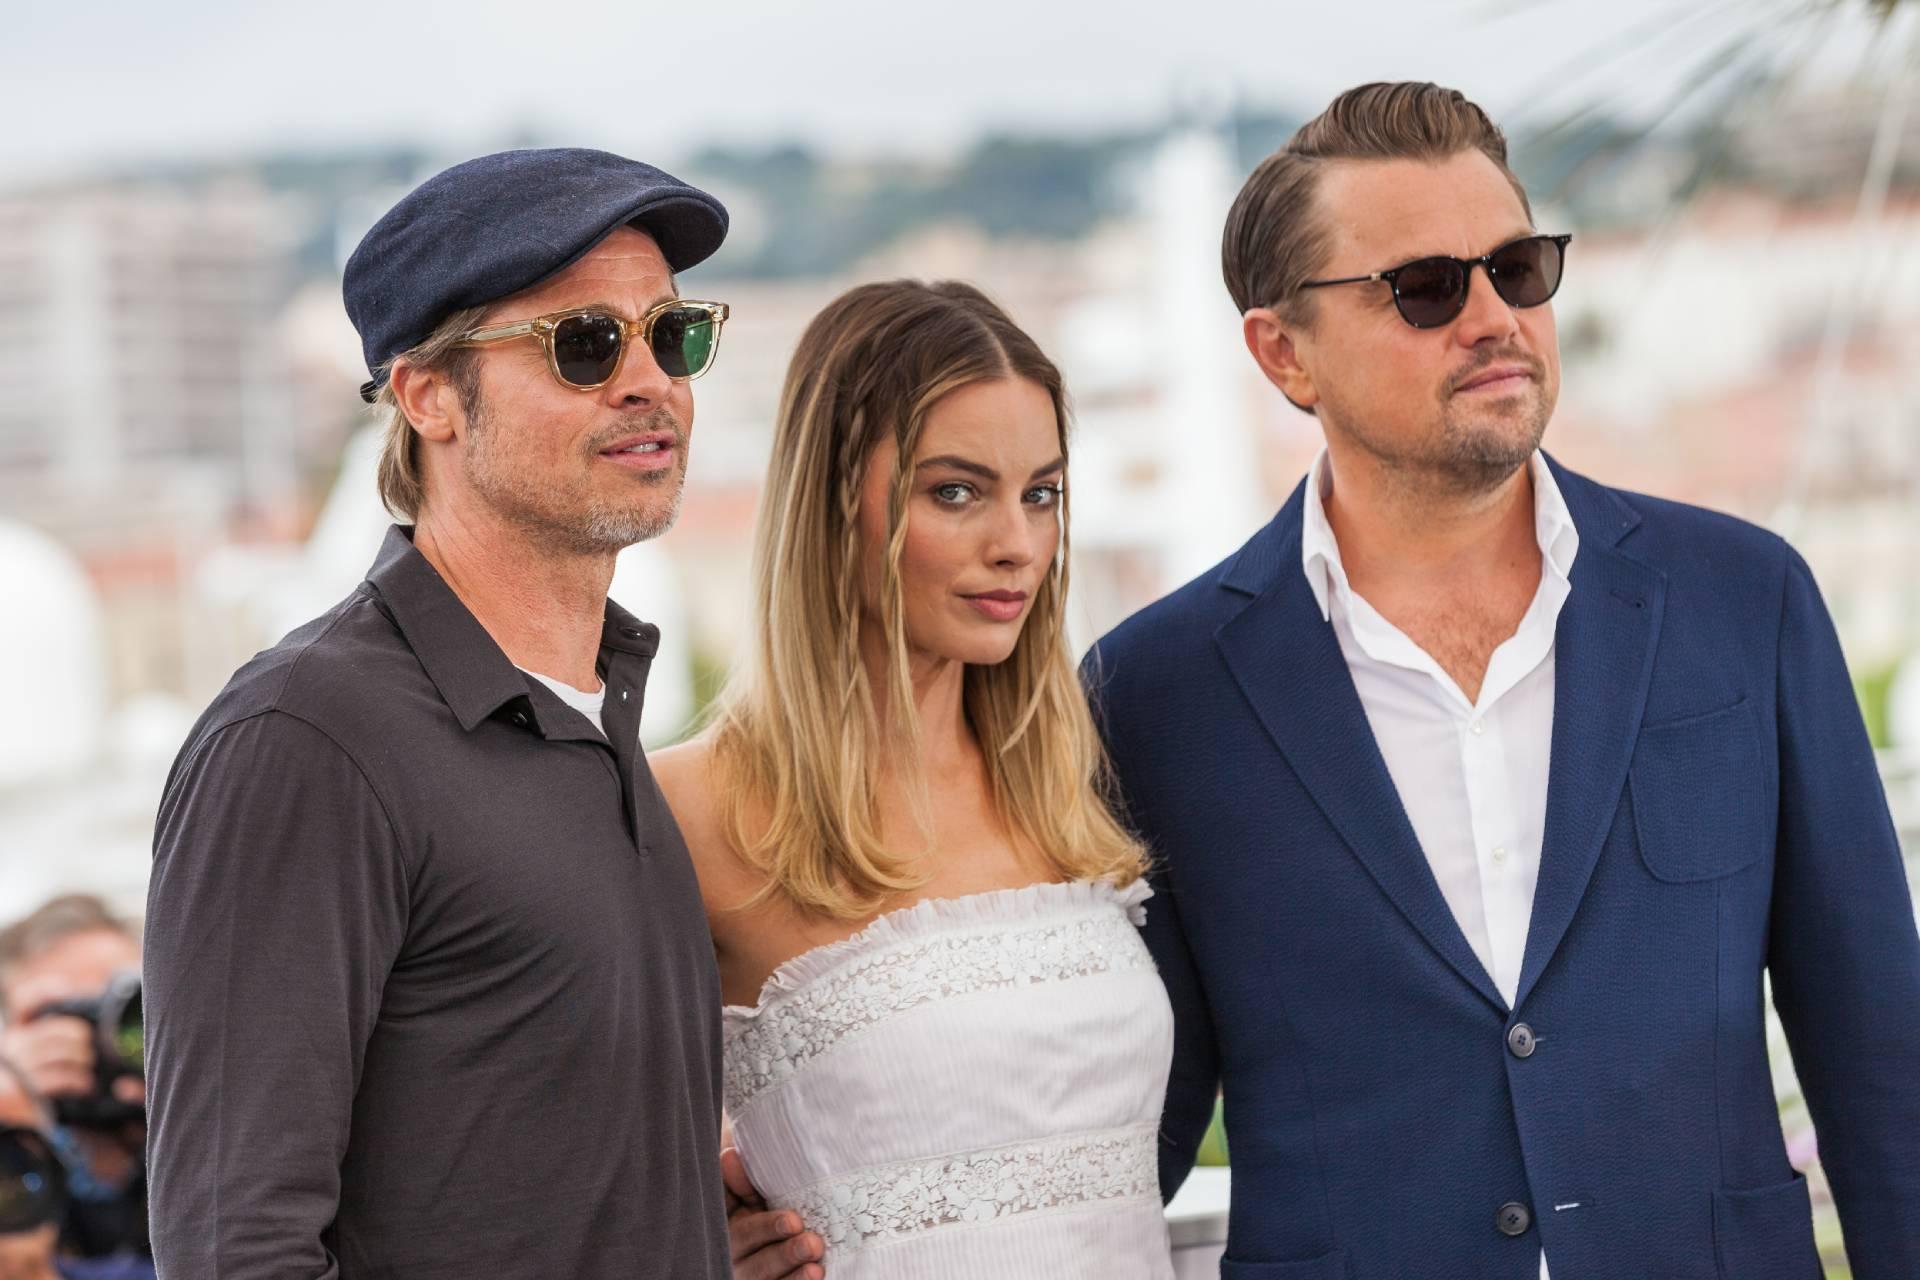 CANNES, FRANCE. May 22, 2019: Brad Pitt, Margot Robbie and Leonardo DiCaprio. | taniavolobueva / Shutterstock.com